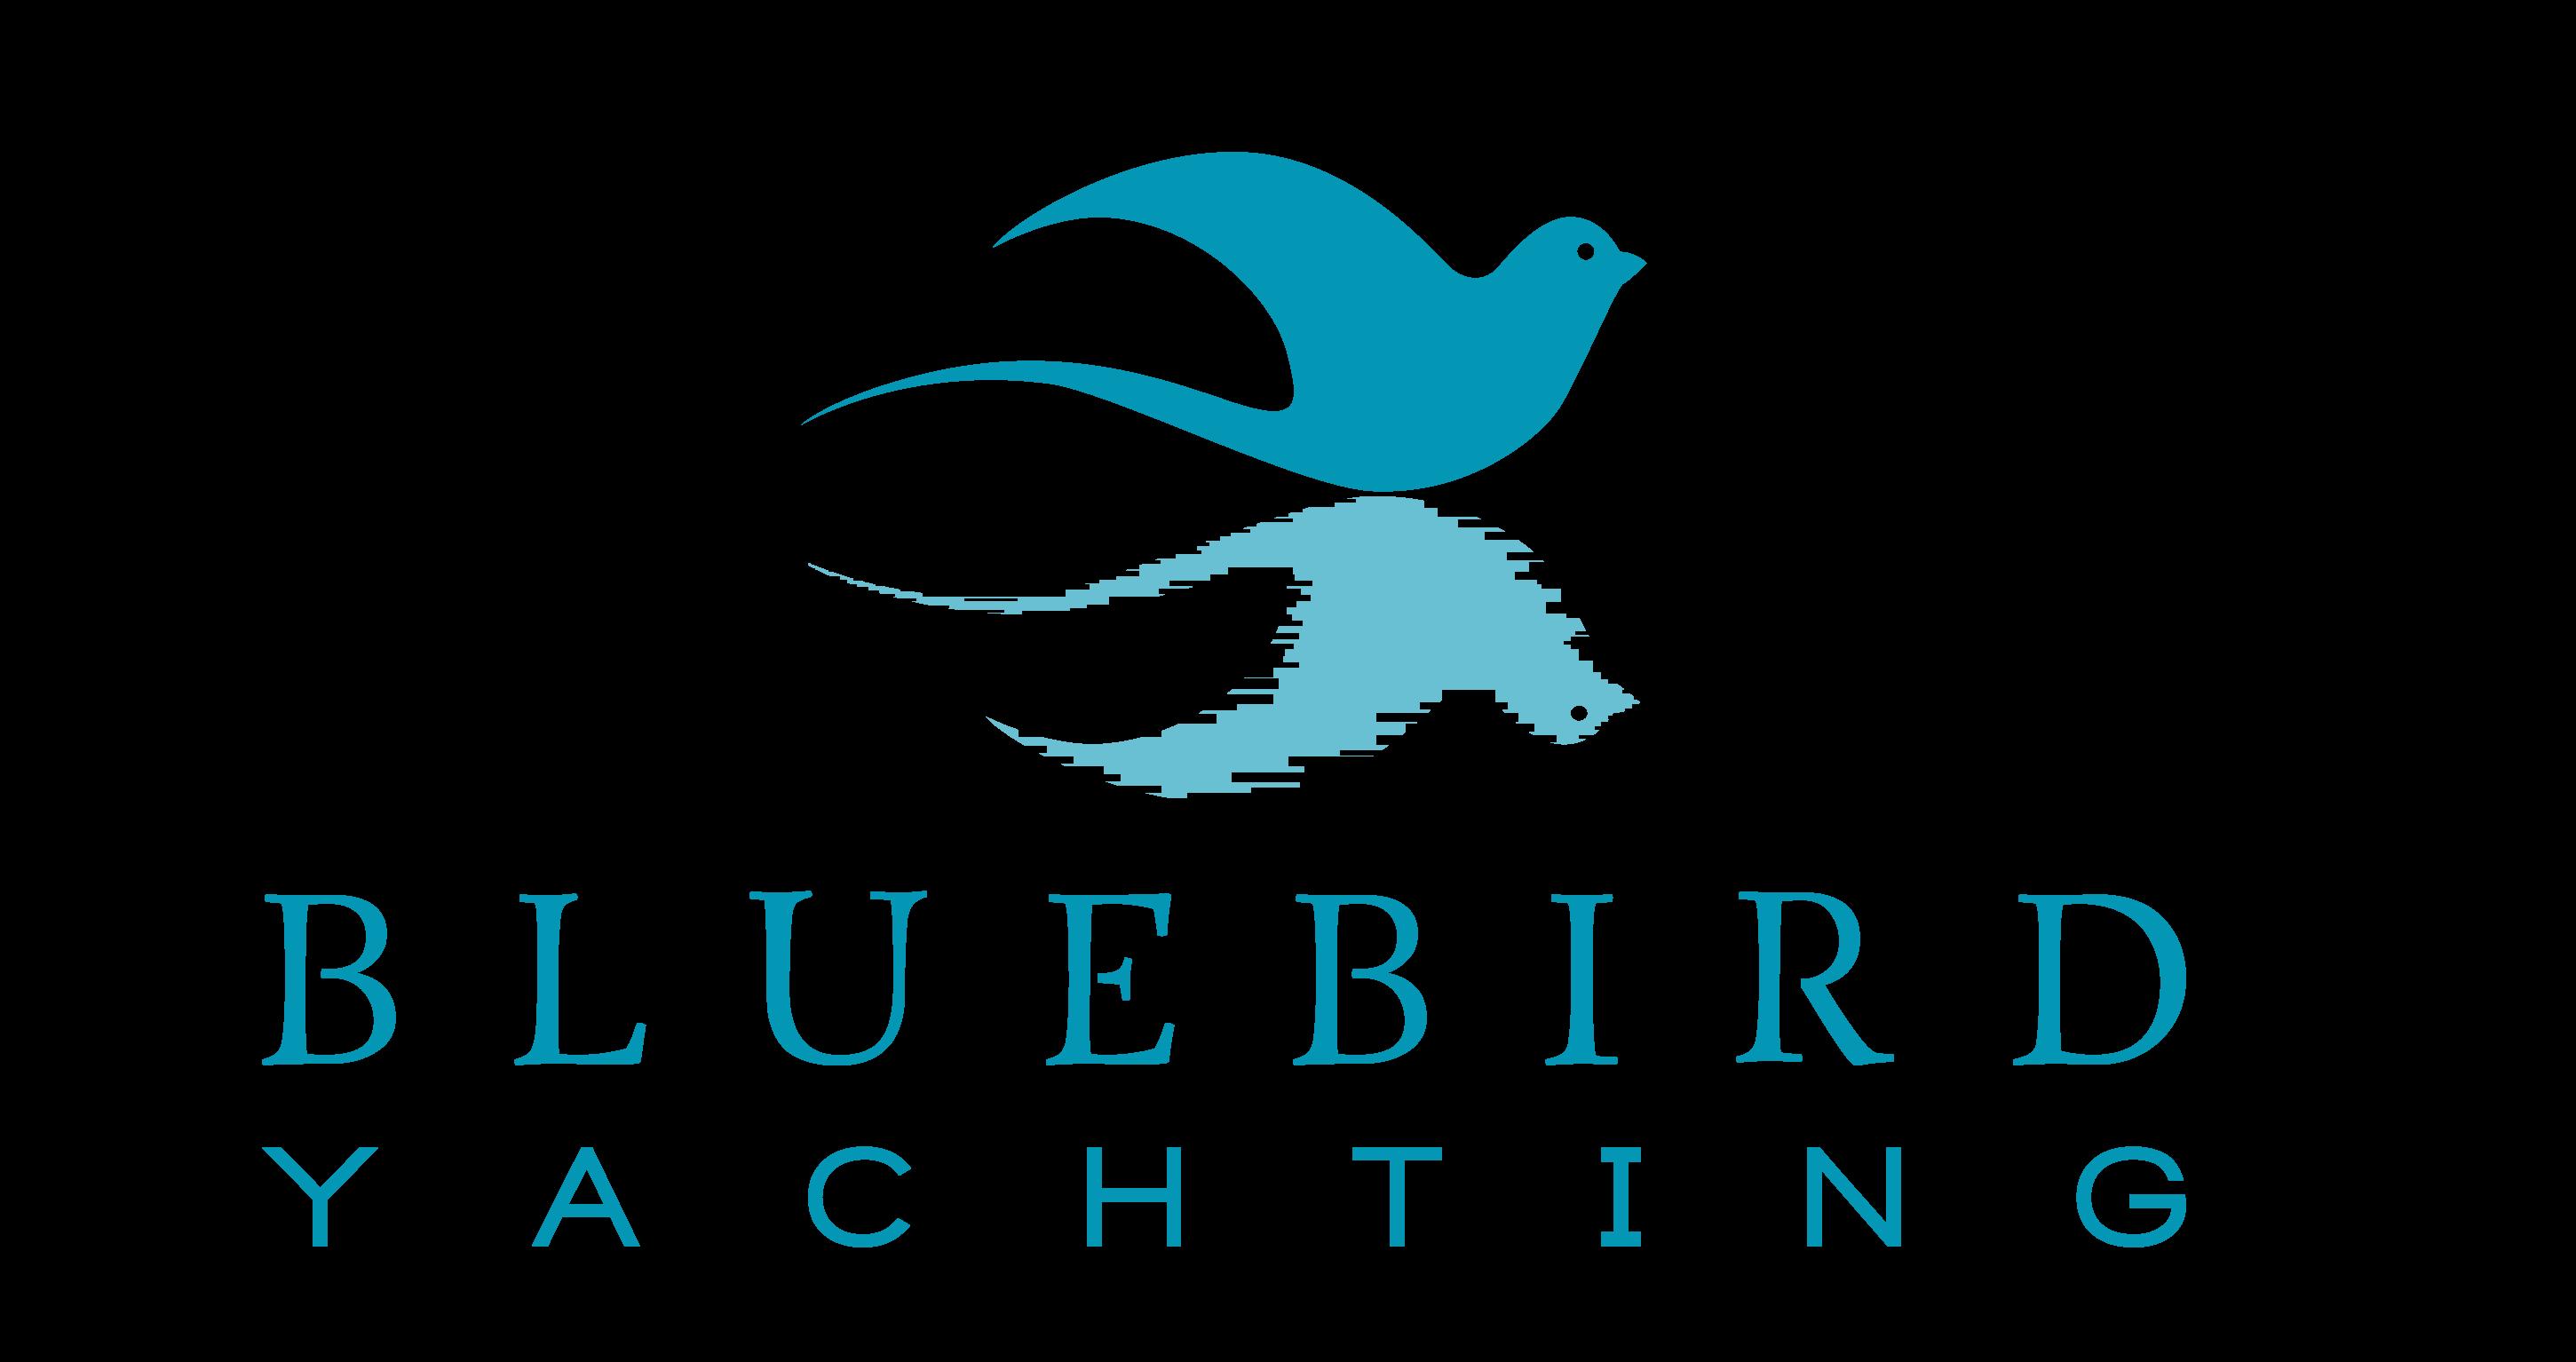 Bluebird Yachting The Cruising Experience Bluebird Yachting